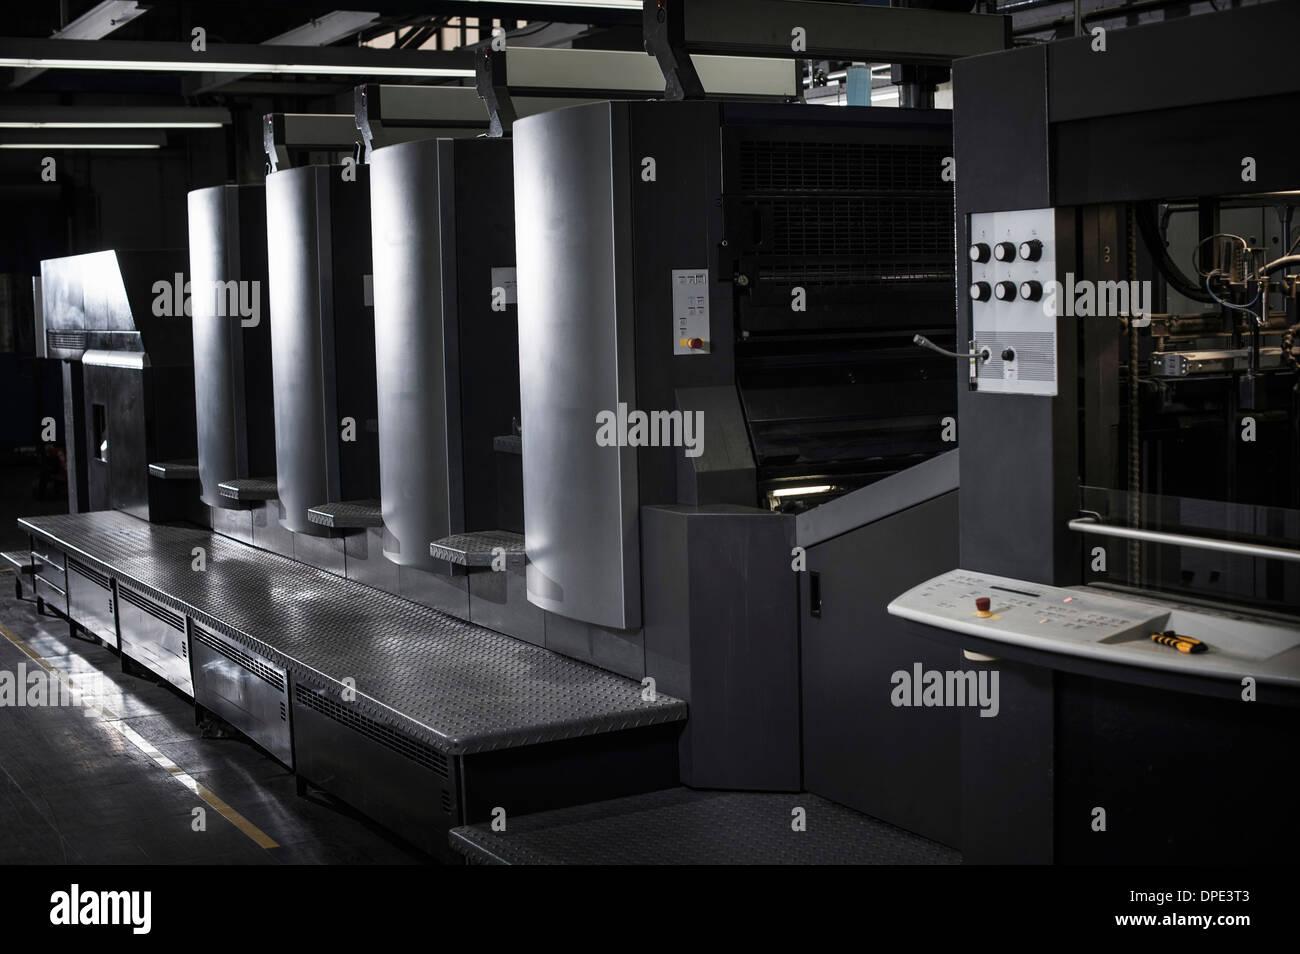 Hallo Tech Druckmaschinen in Druckwerkstatt Stockfoto